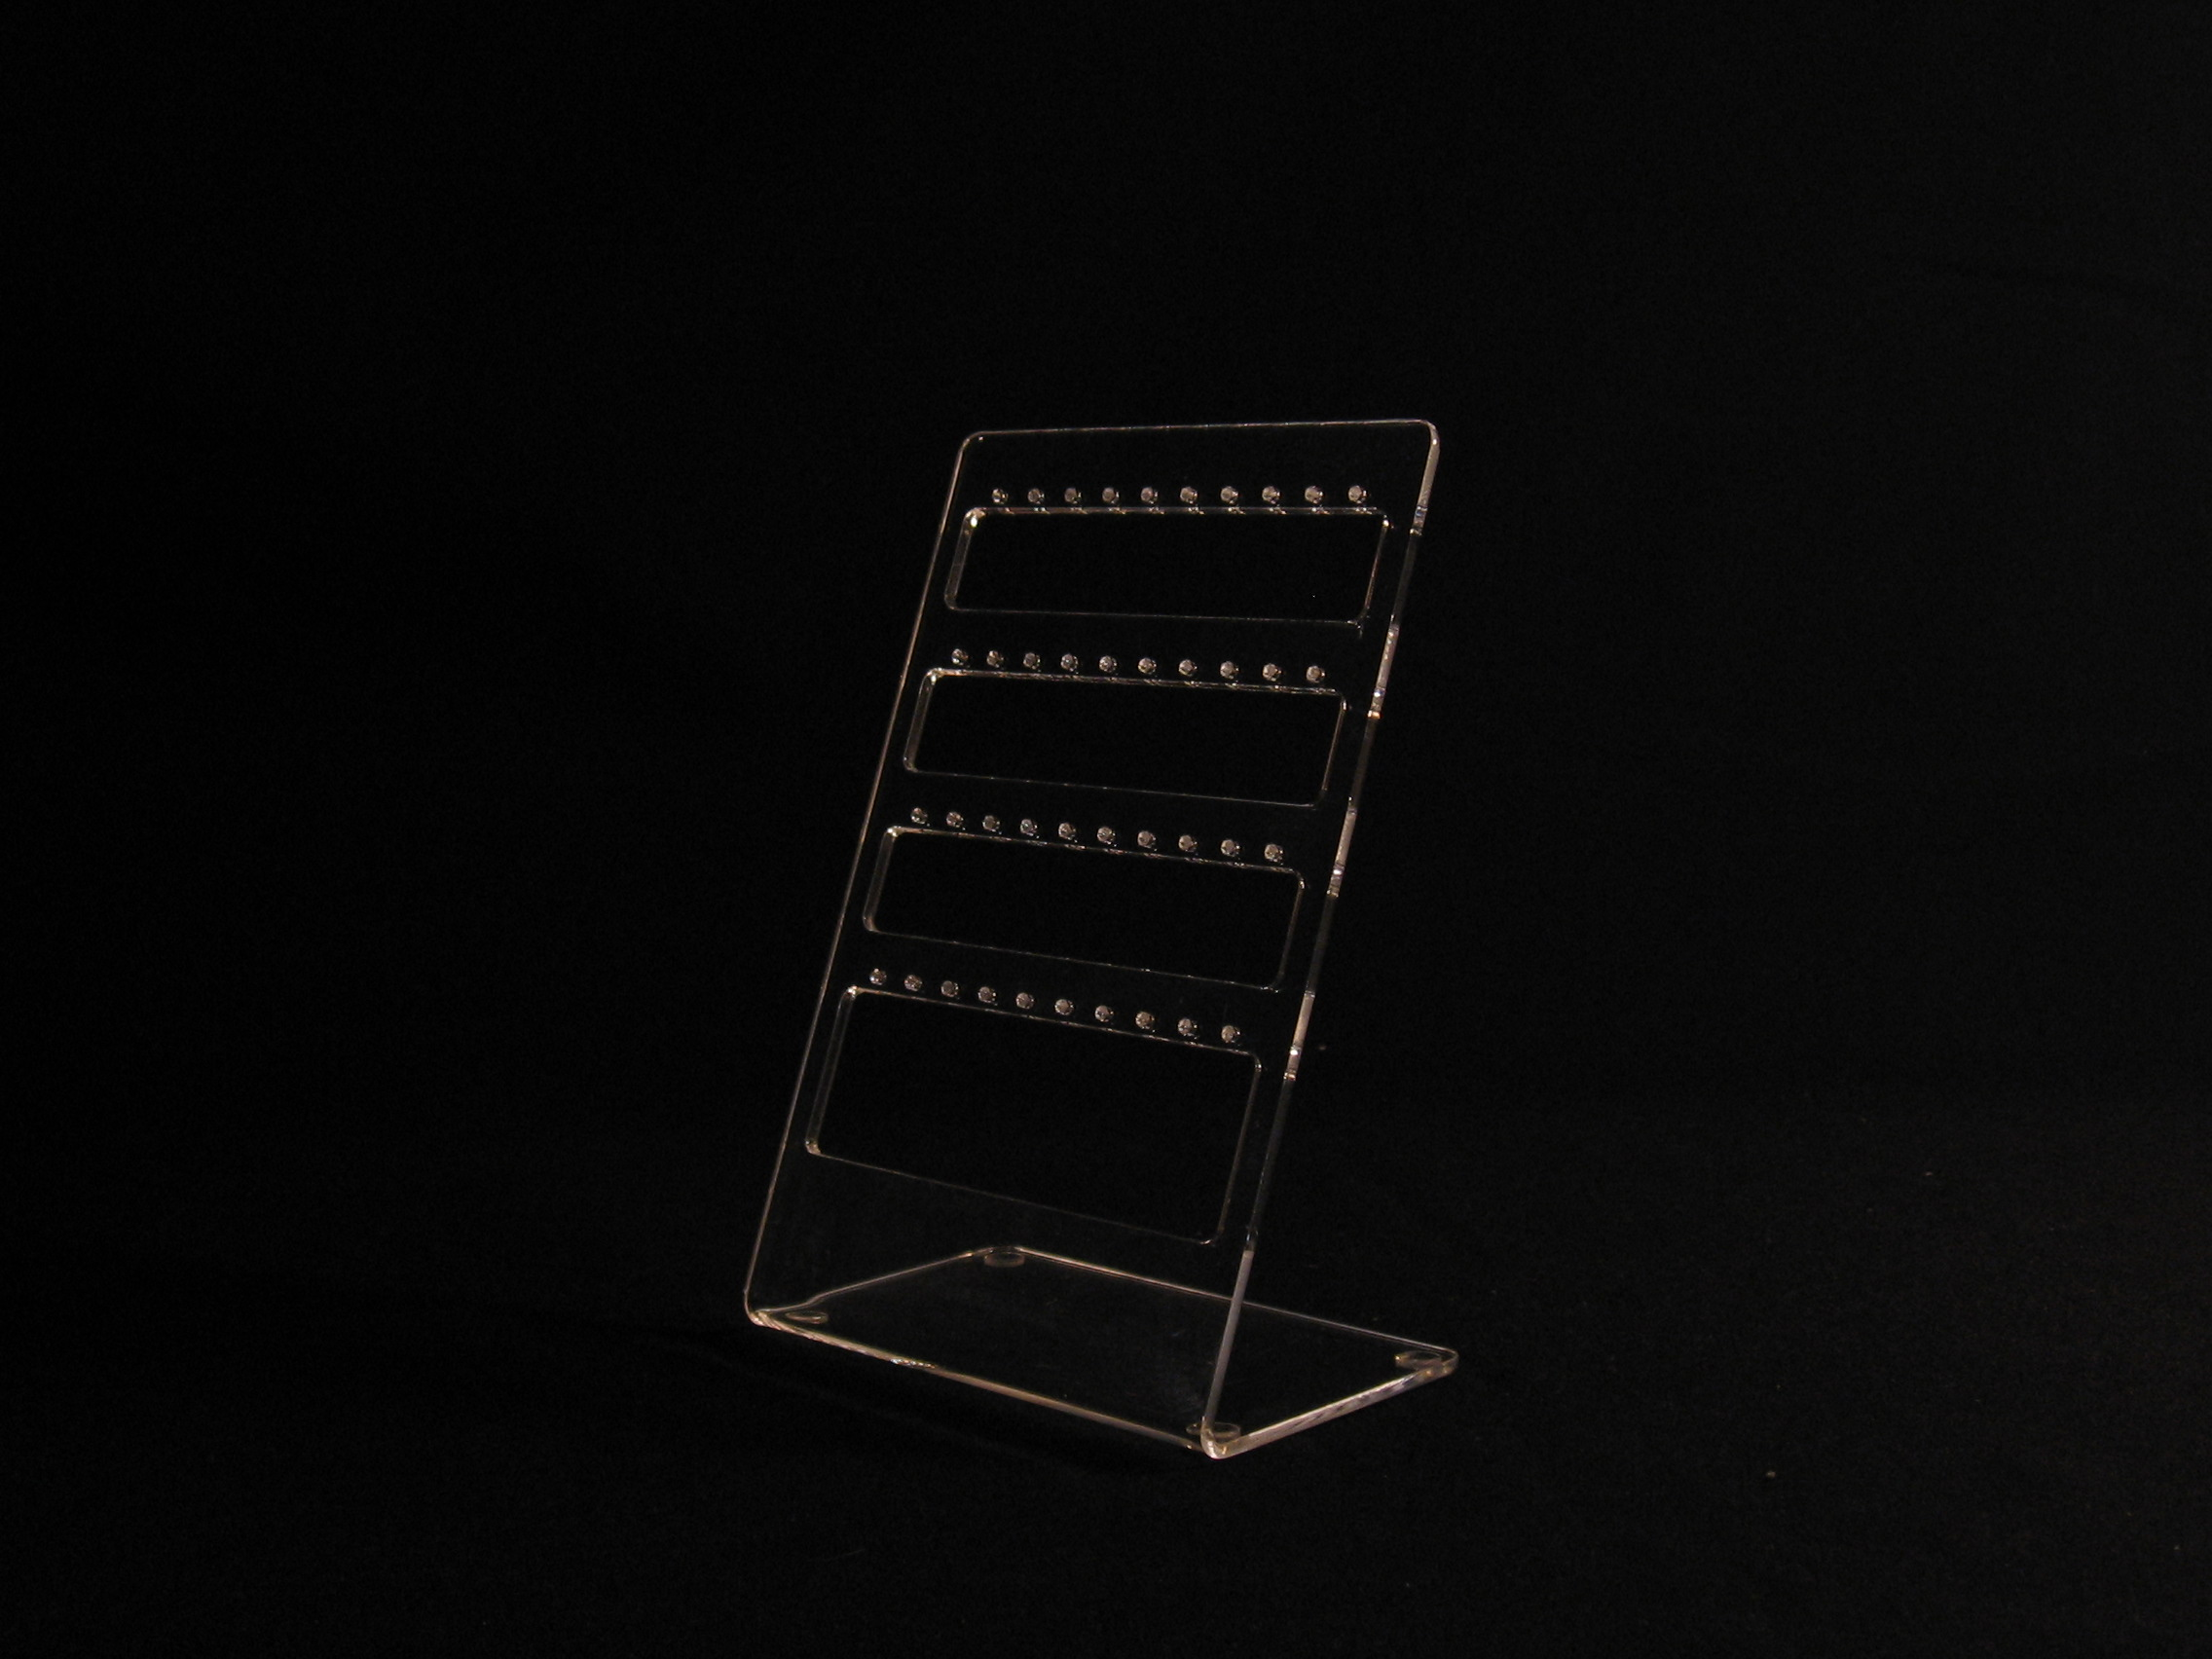 Stoni držač za nakit mindjuse pleksliglas klirit SNG1